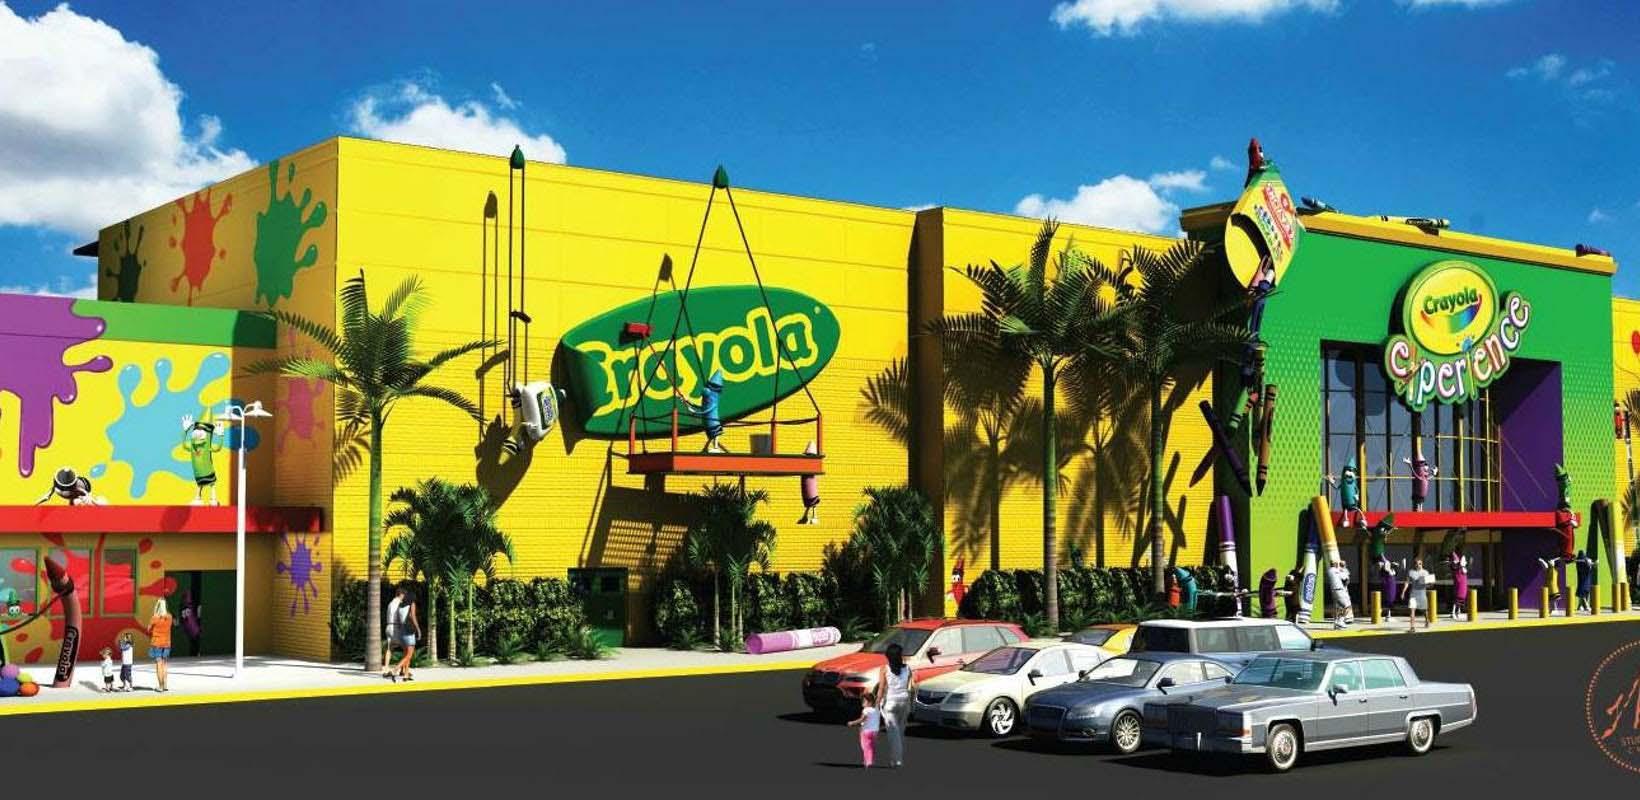 Tickets to the Crayola Experience Orlando